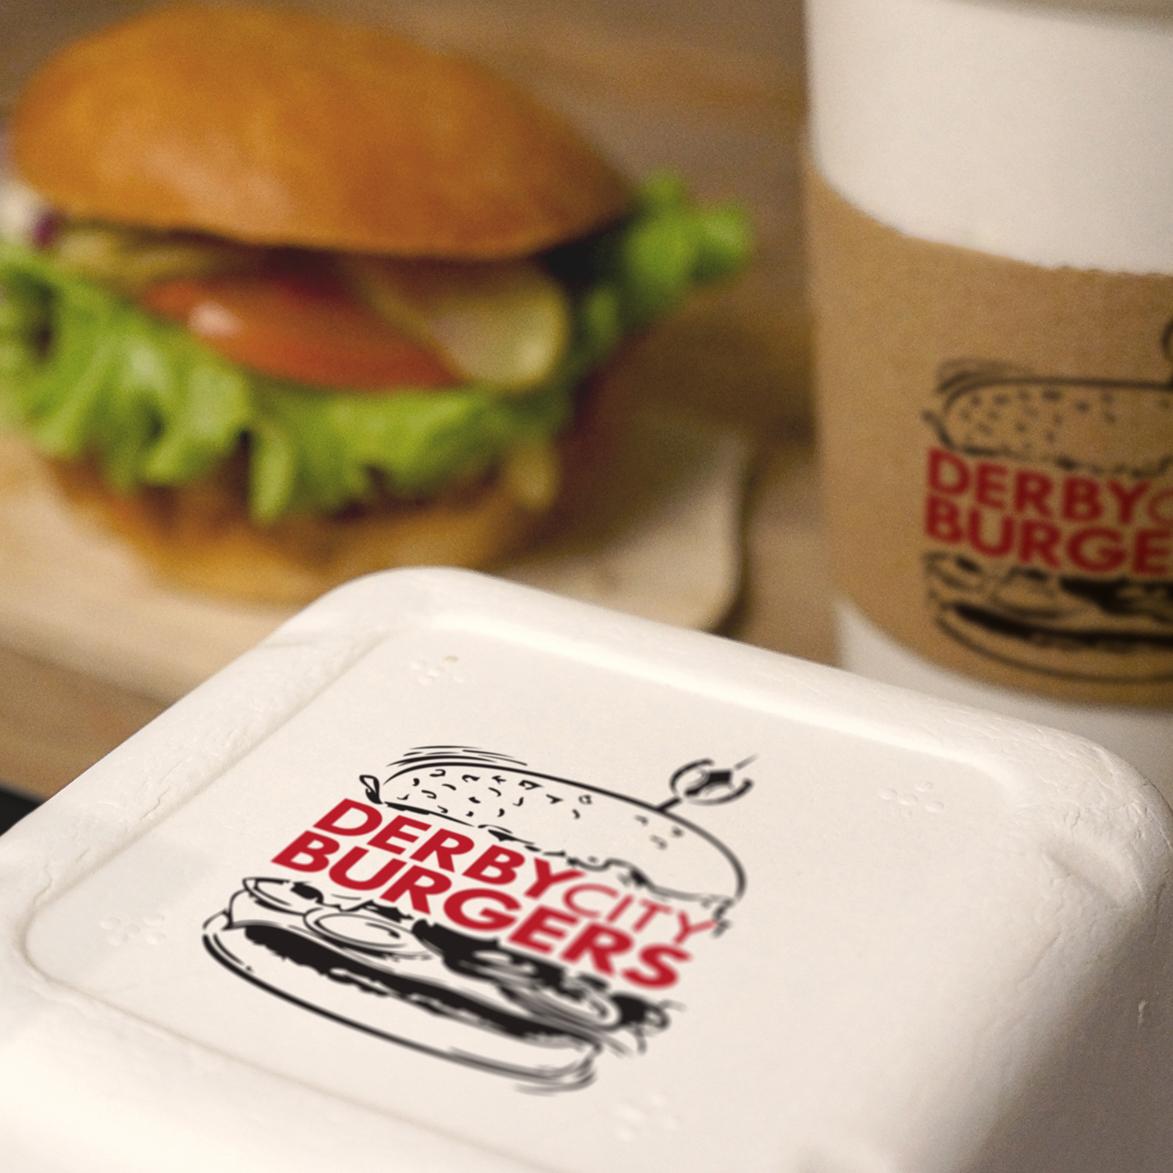 derby-city-burgers-logo-design-thumbnail.jpg